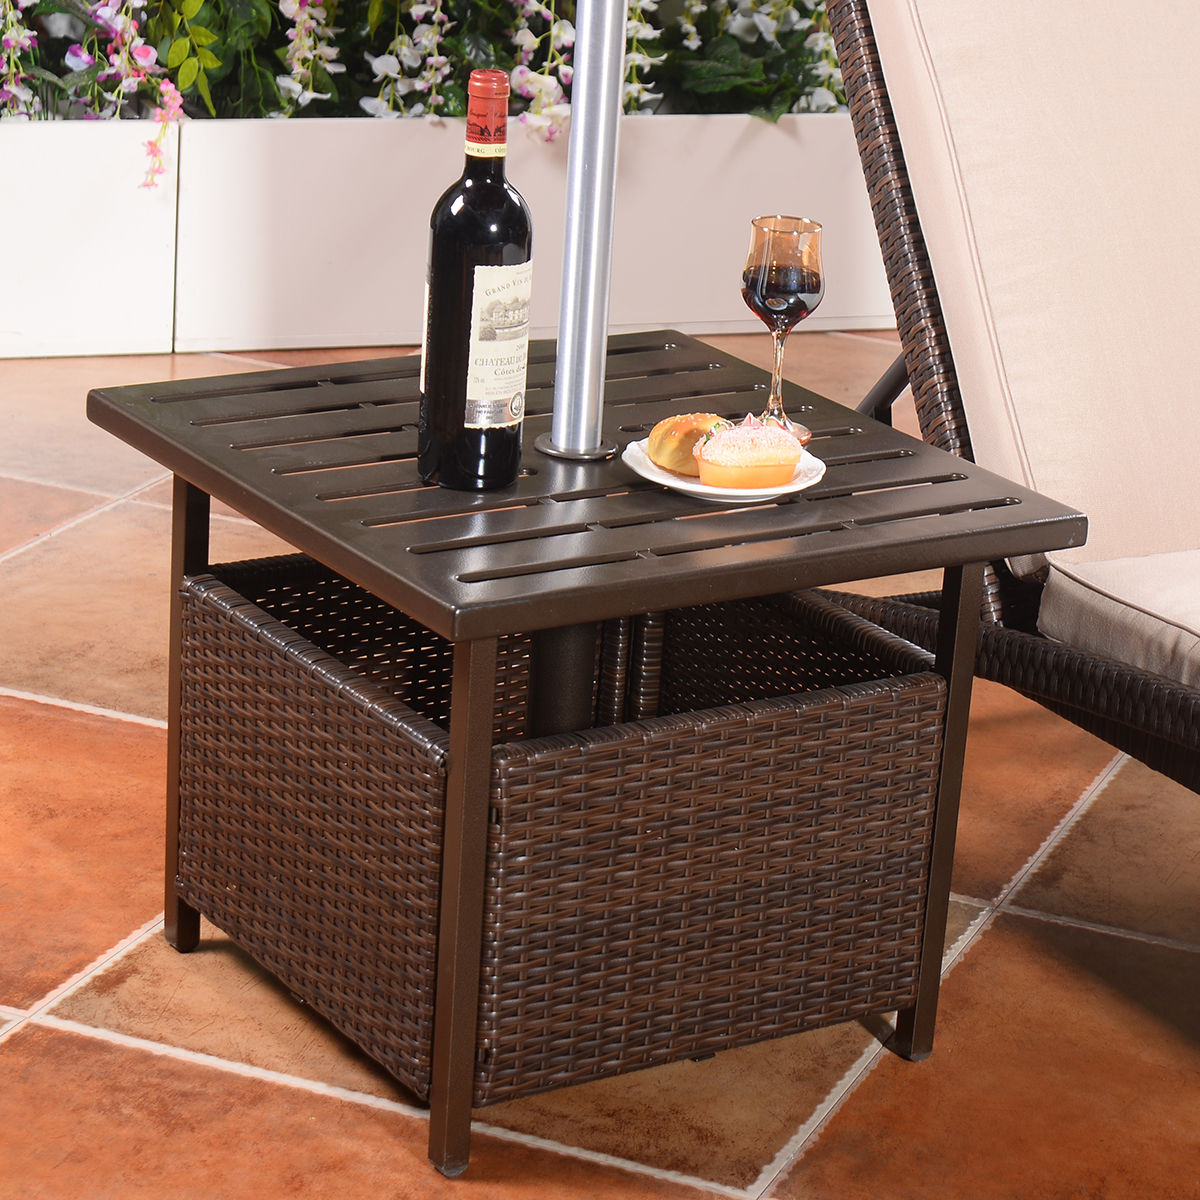 Costway Brown Rattan Wicker Steel Side Table Outdoor Furniture Deck Garden Patio Pool by Costway